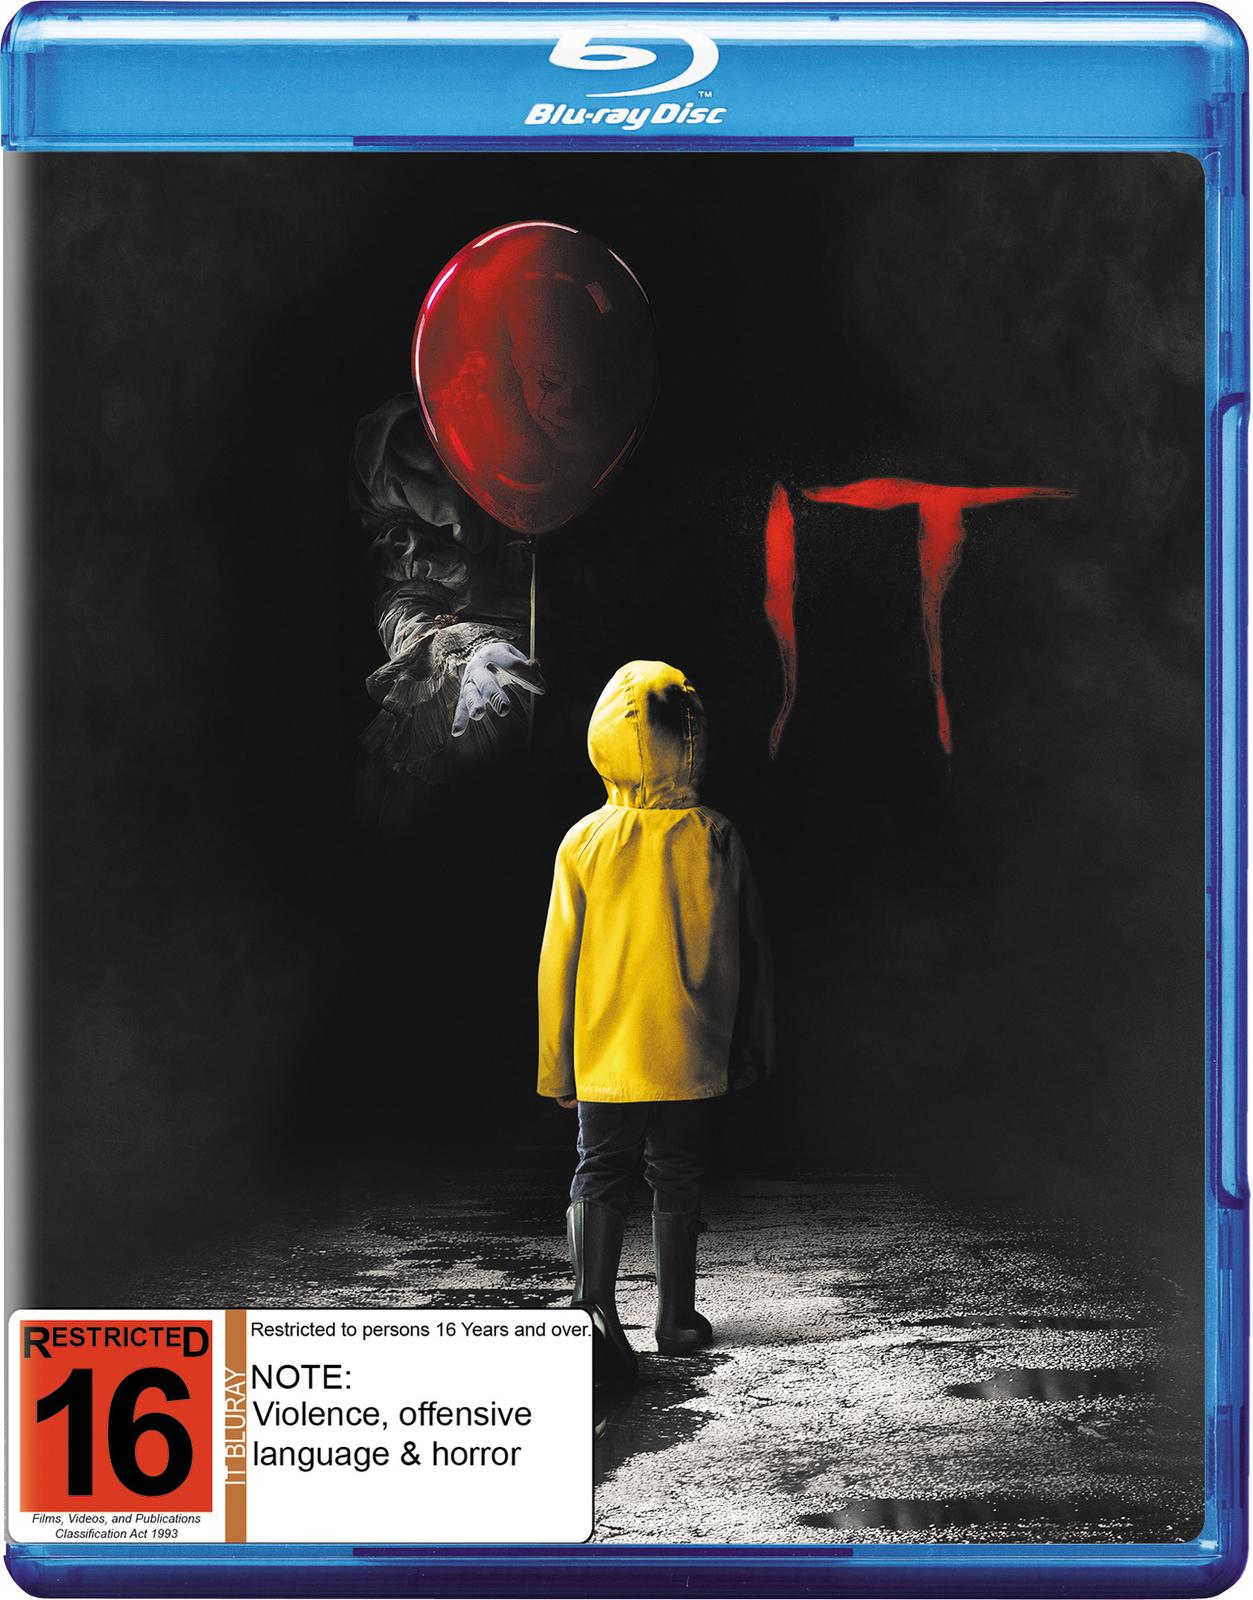 It (2017) on Blu-ray image